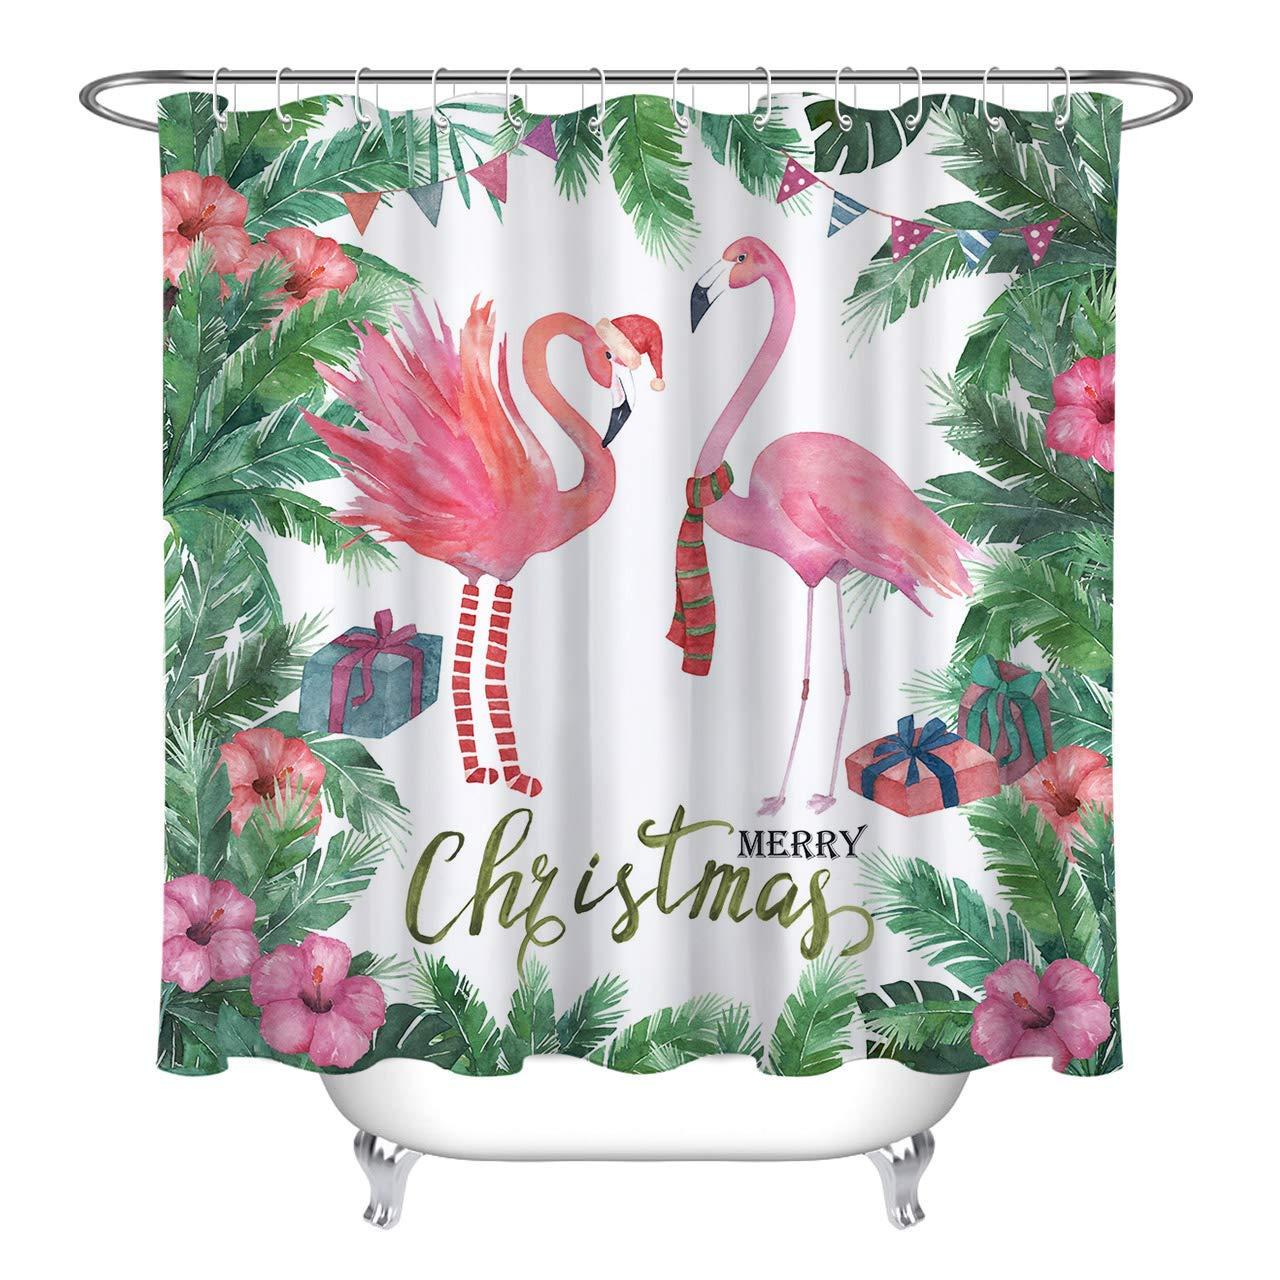 Us 17 78 16 Off Watercolor Christmas Flamingo Shower Curtain Set Green Tropical Plant Palm Leaves Bathroom Curtain Decor Bath Curtain Hooks In